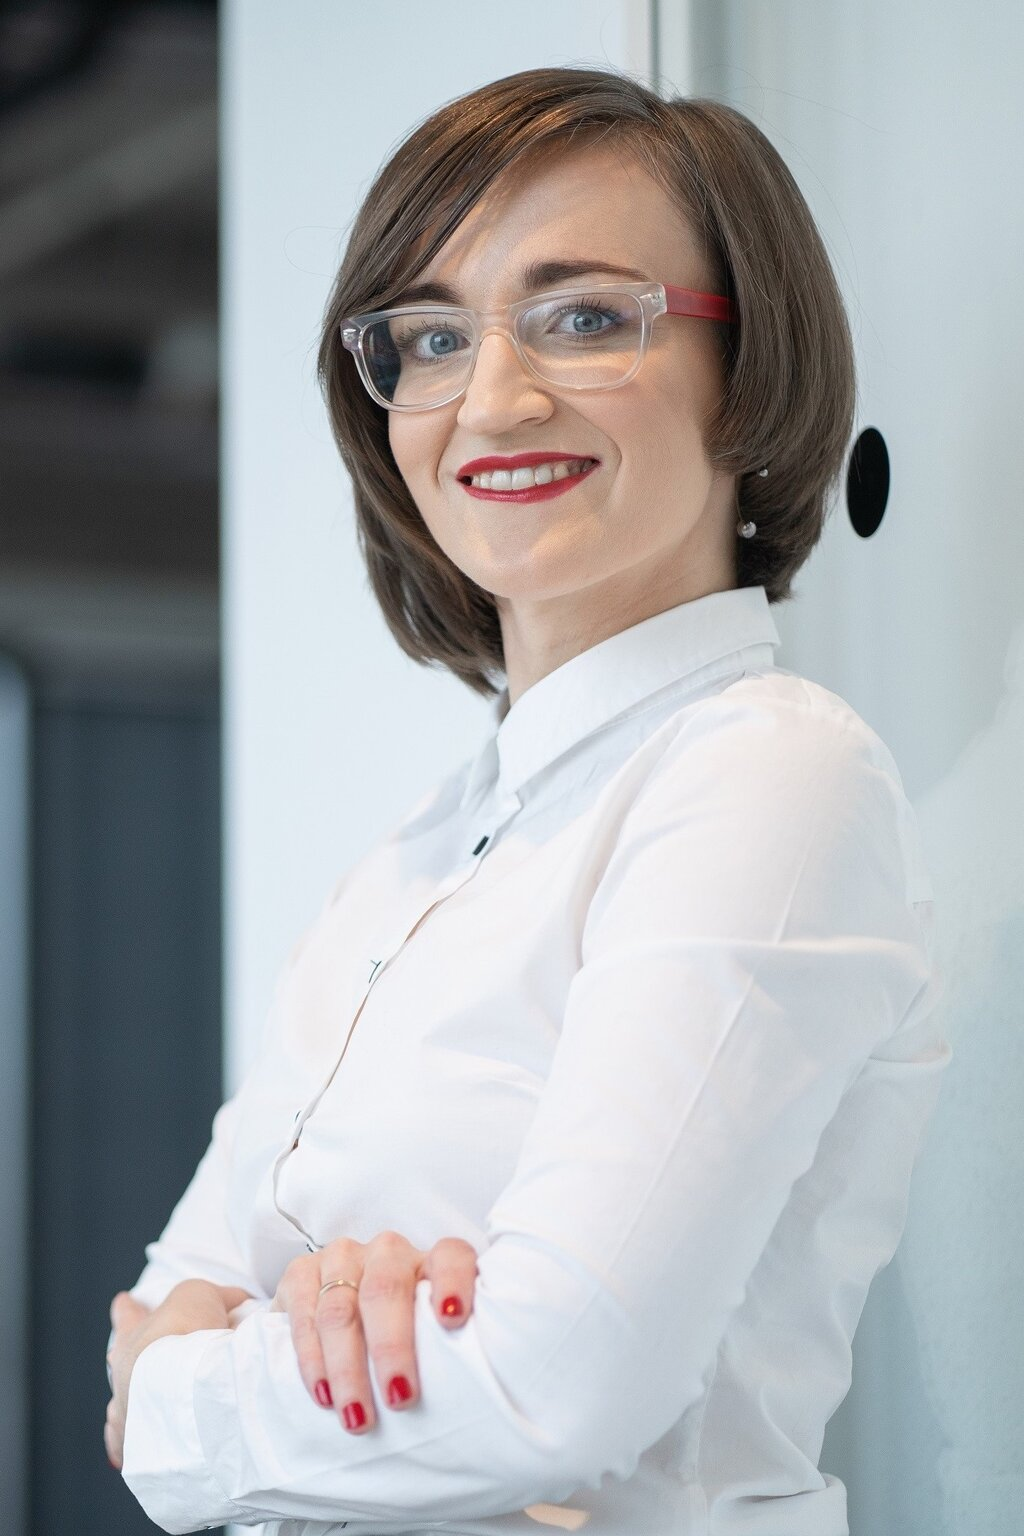 Luiza Jurgiel-Żyła (9) media